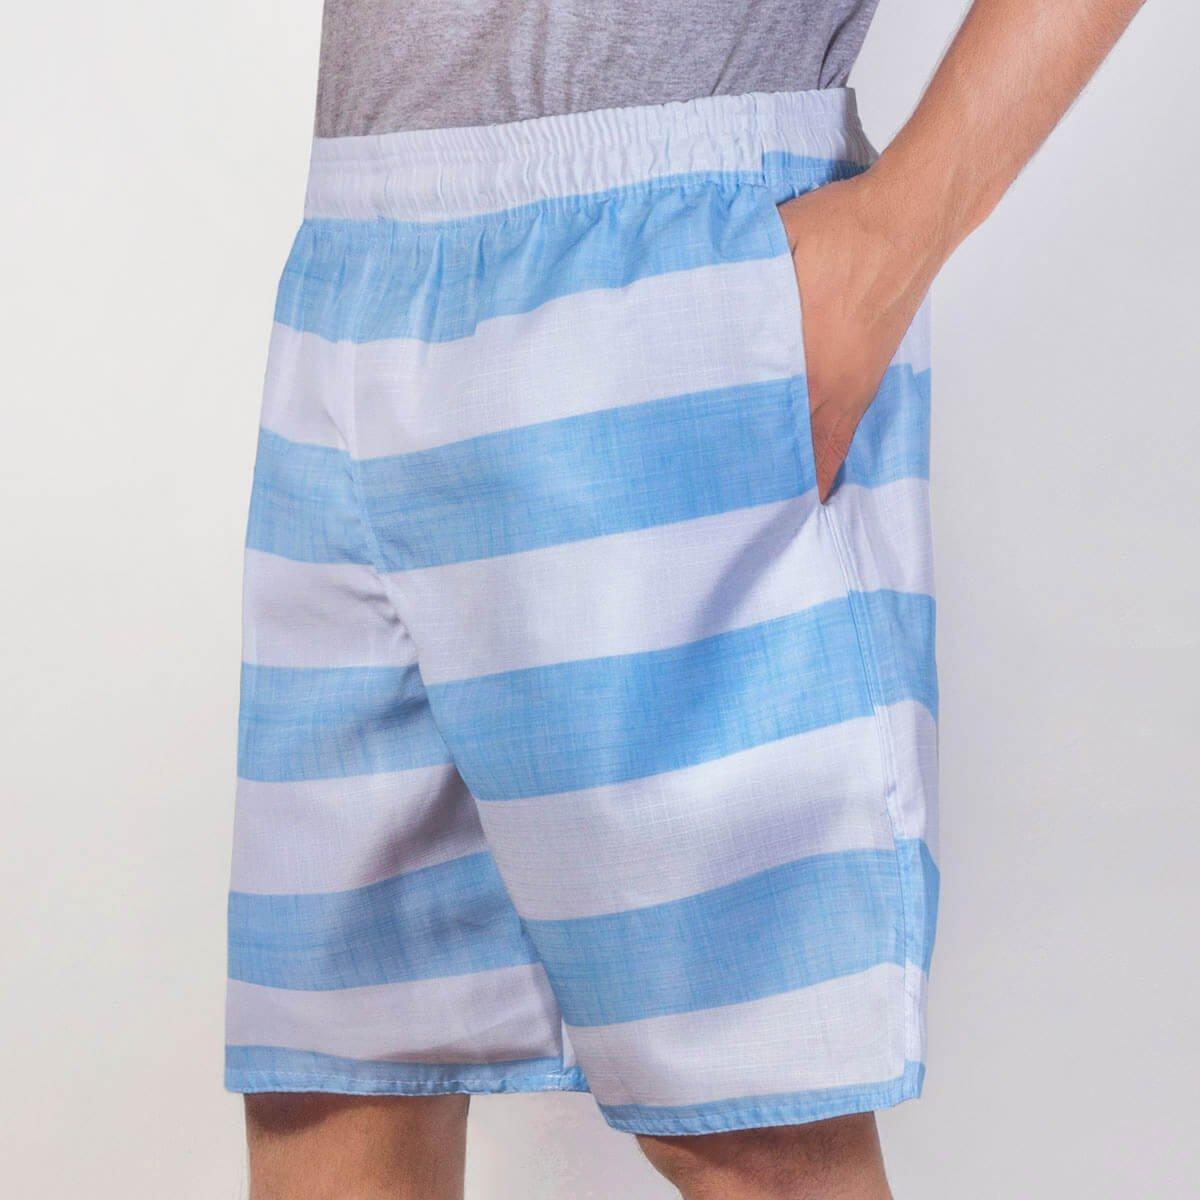 Azul Jeans/Branco